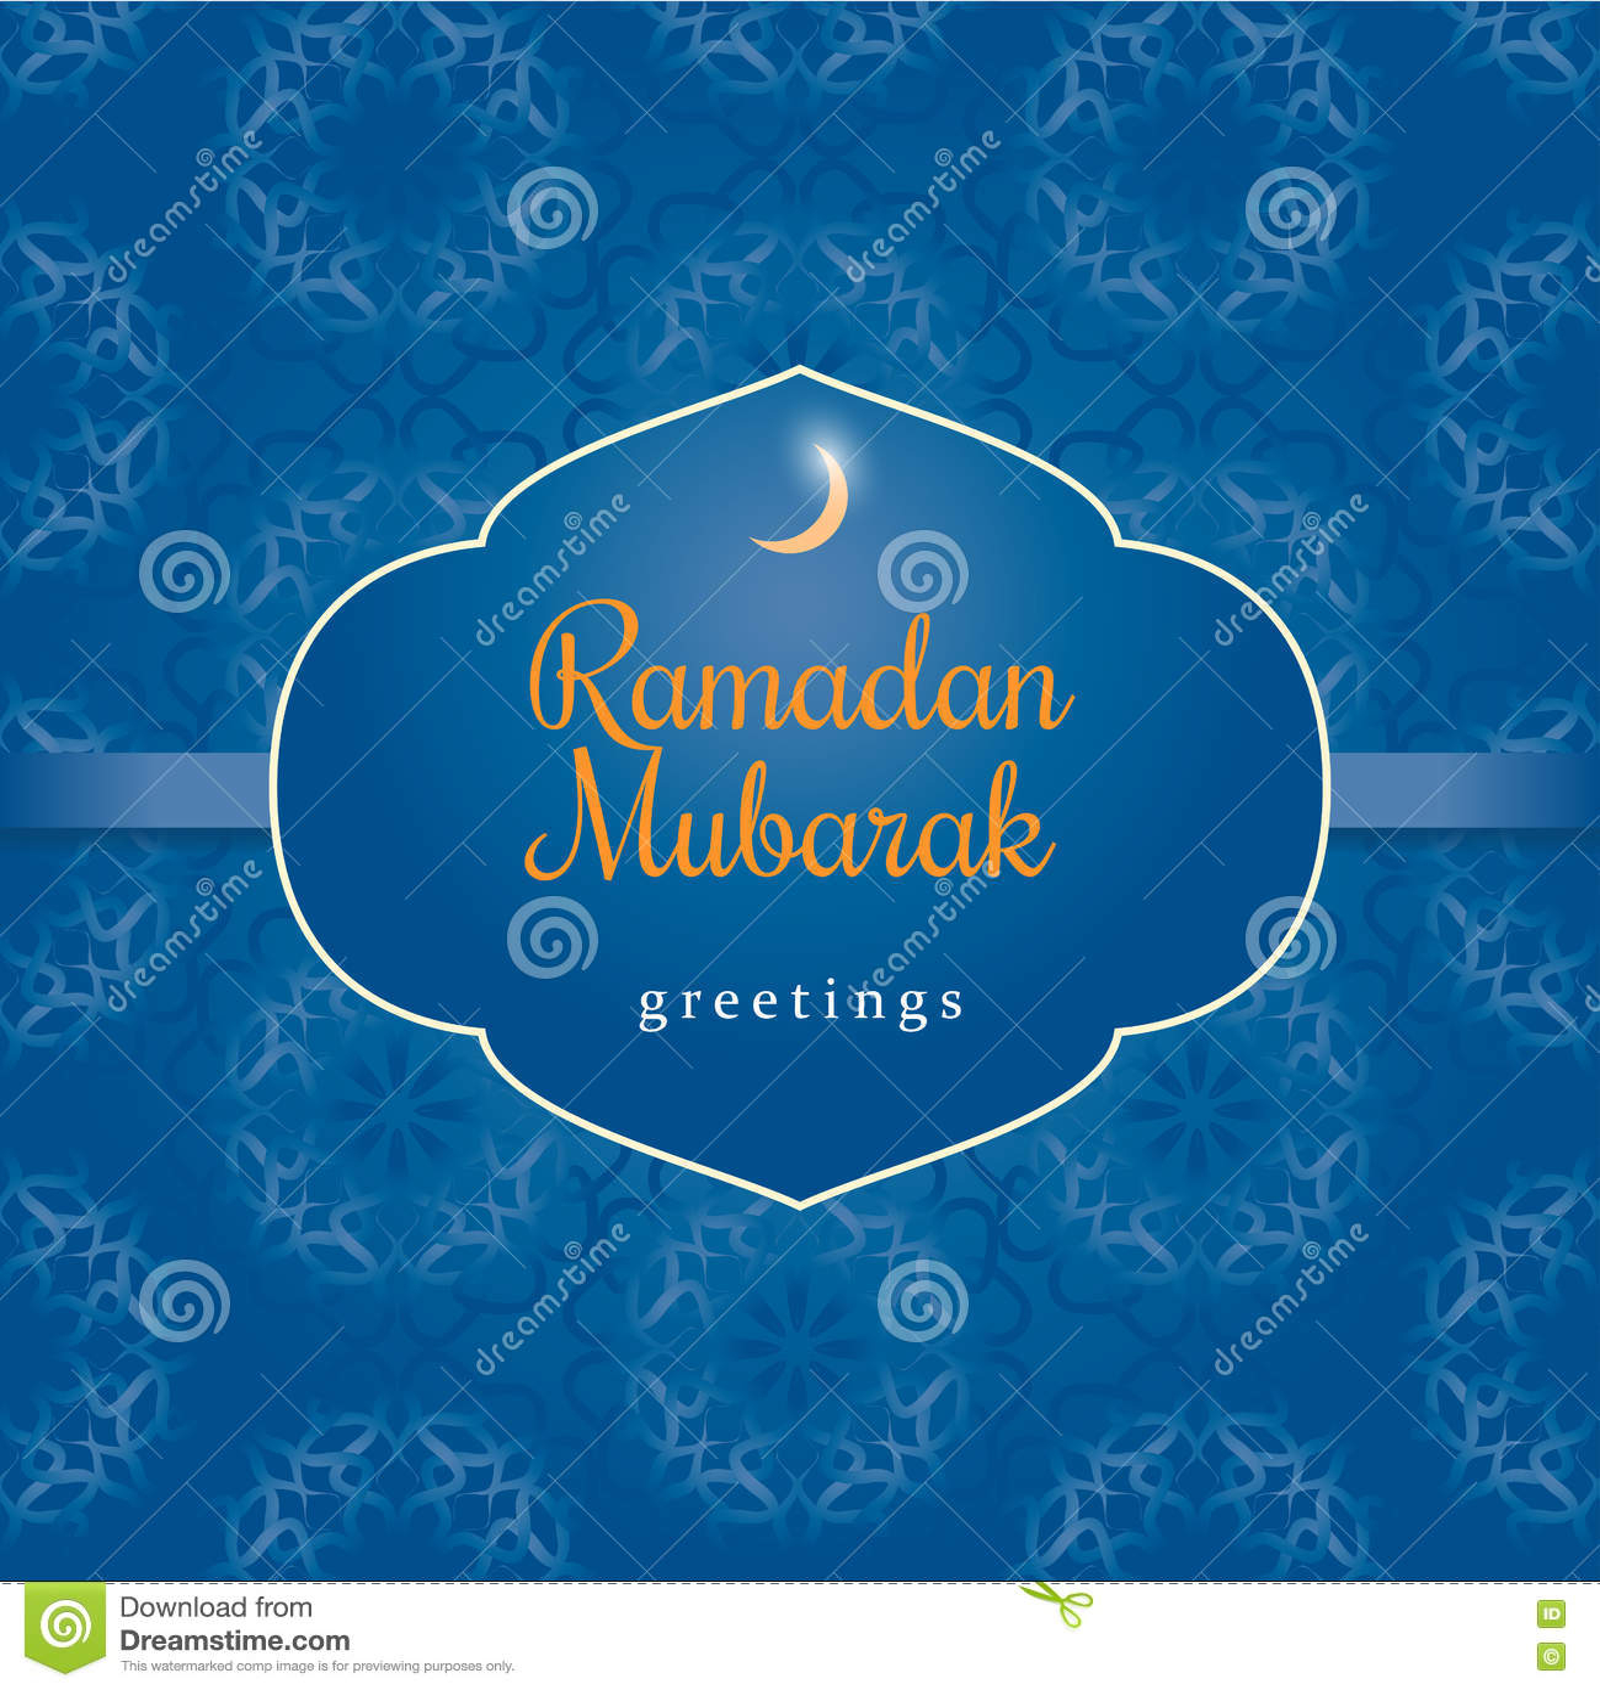 Ramadan greetings background ramadan stock vector illustration of ramadan greetings background ramadan kristyandbryce Images